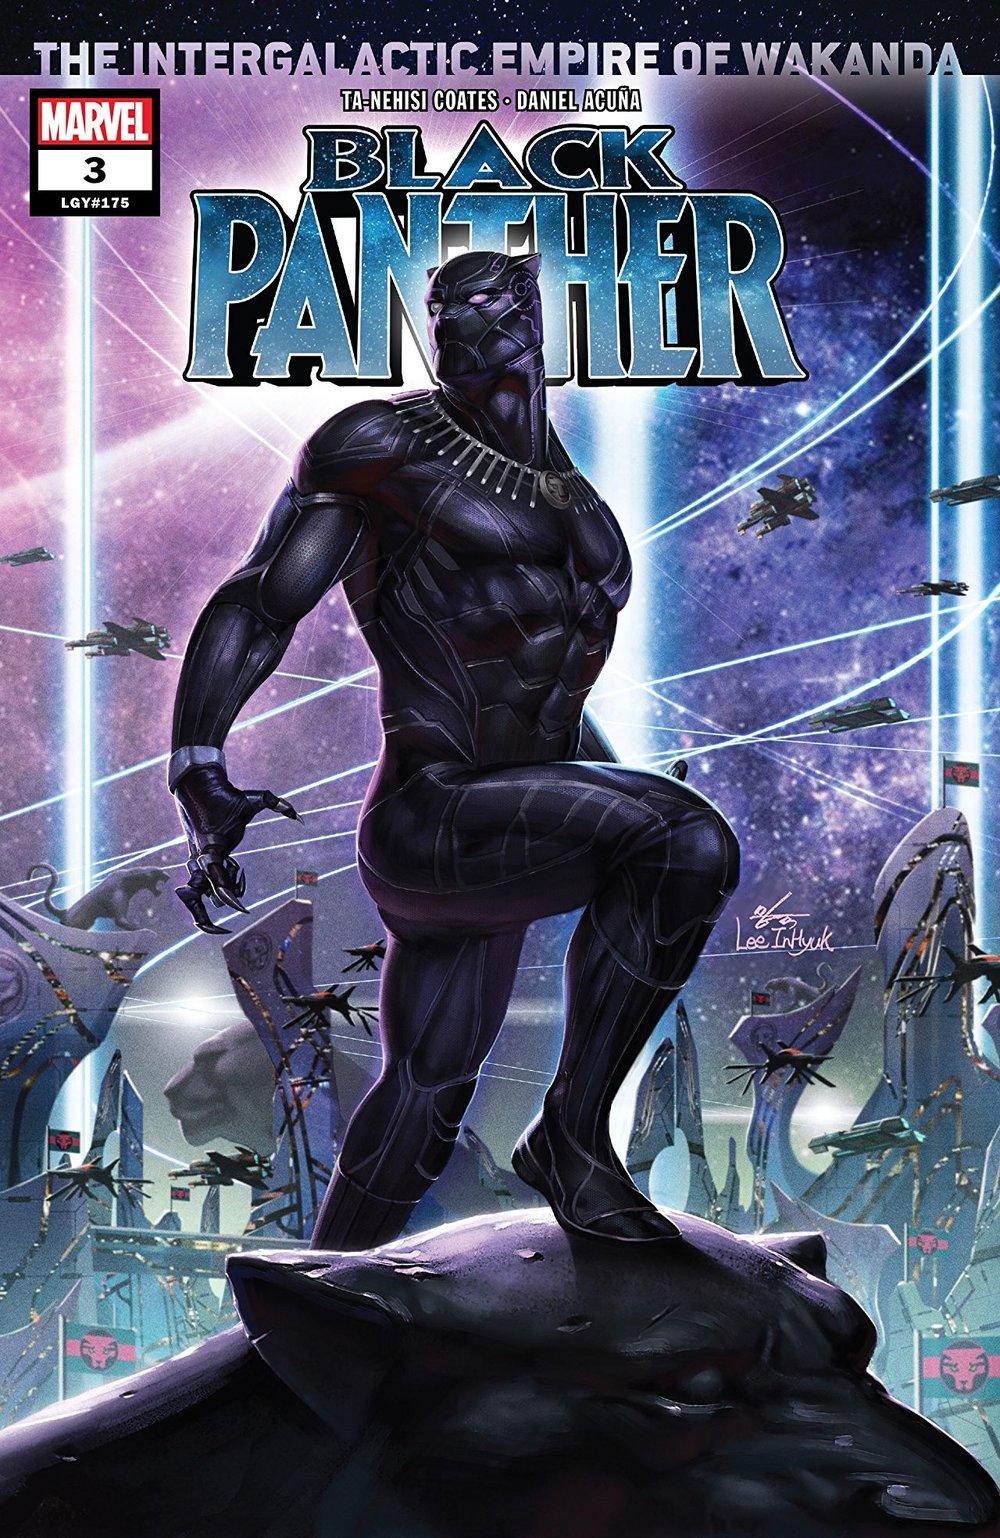 Black Panther #3 - Writer: Ta-Nehisi CoatesArtist: Daniel AcuñaLetterer: VC's Joe SabinoCover artist: Inhyuk Lee